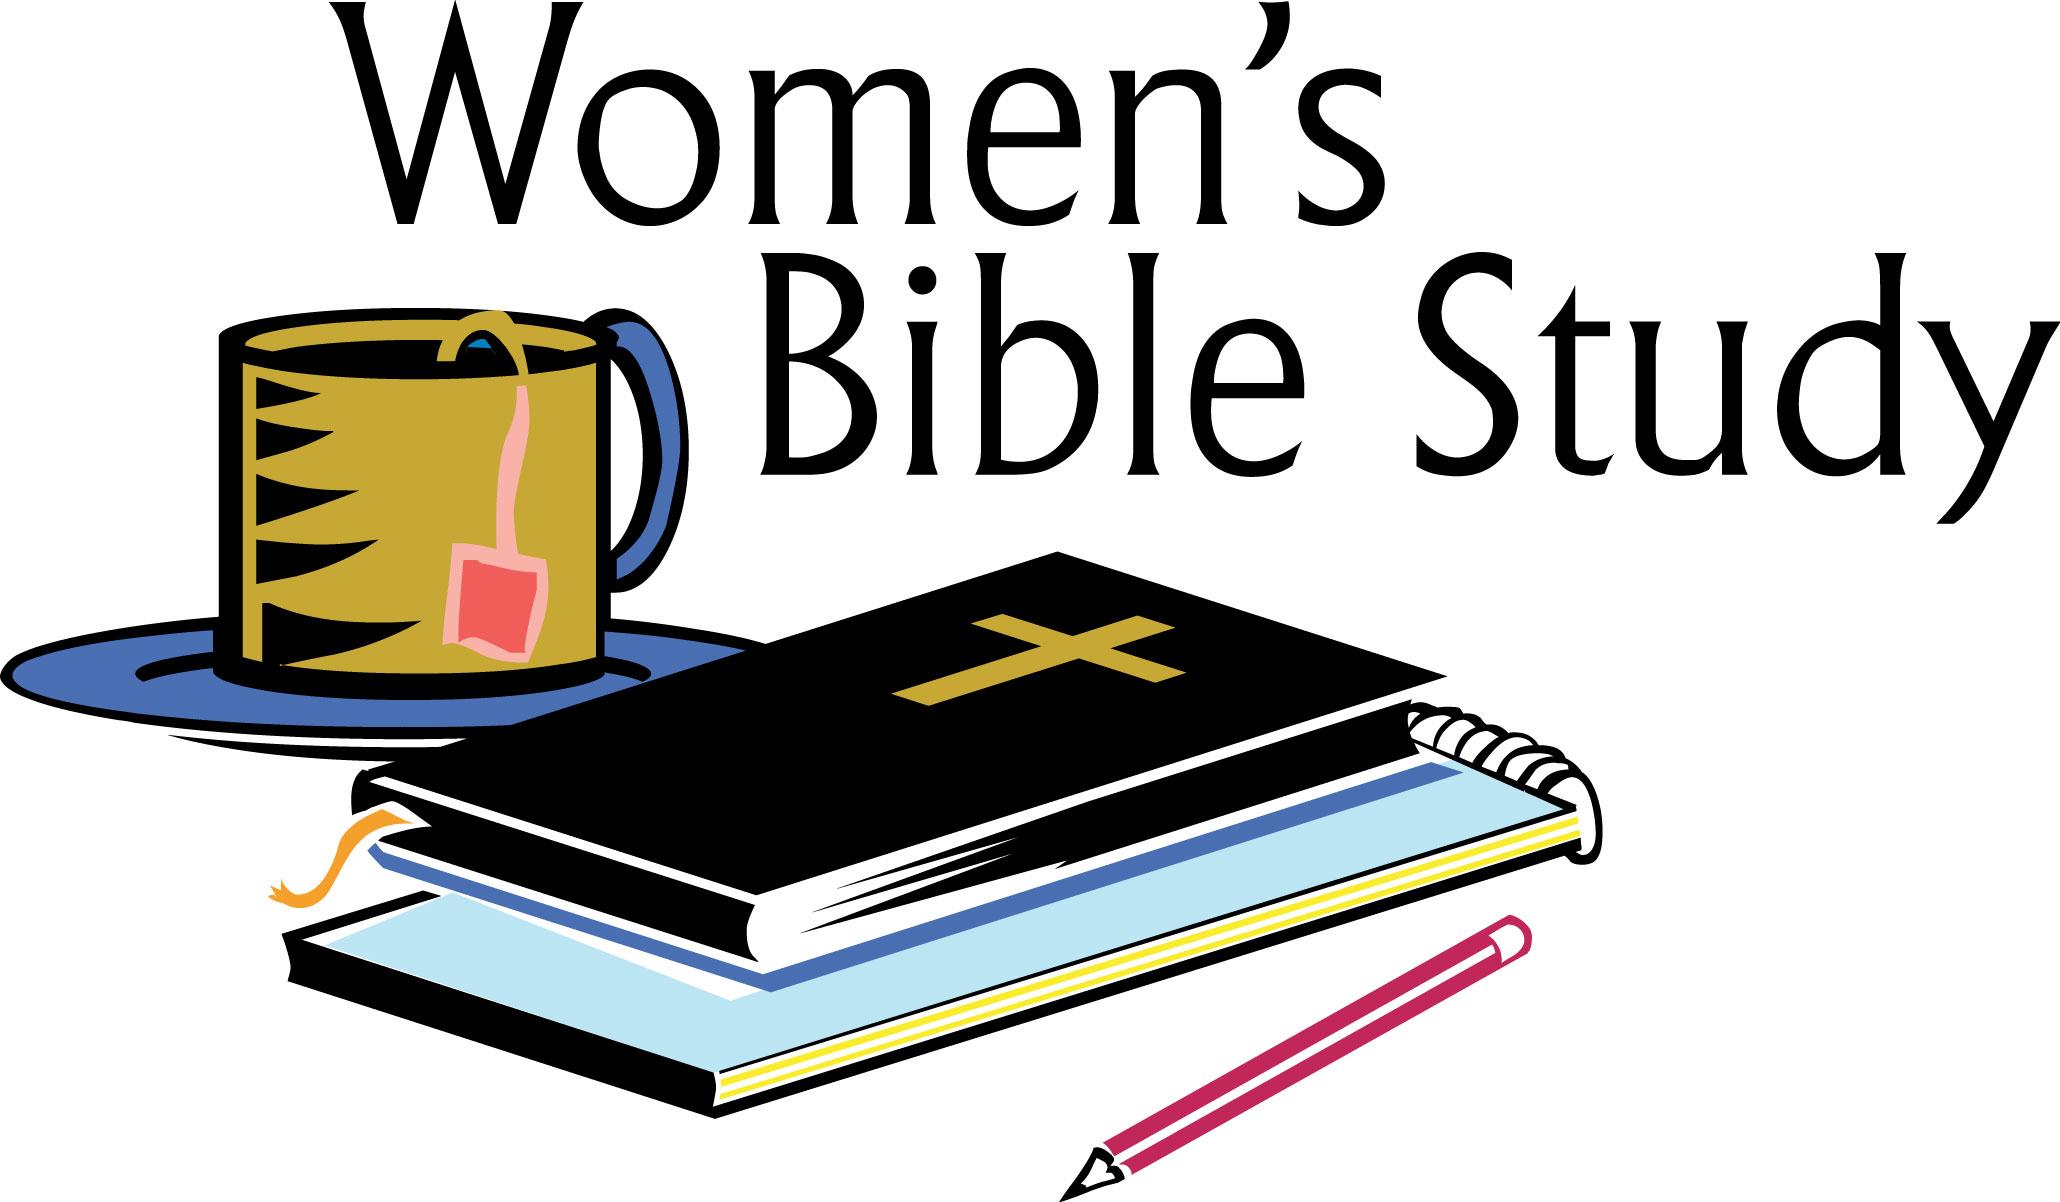 Womens bible study clipart.